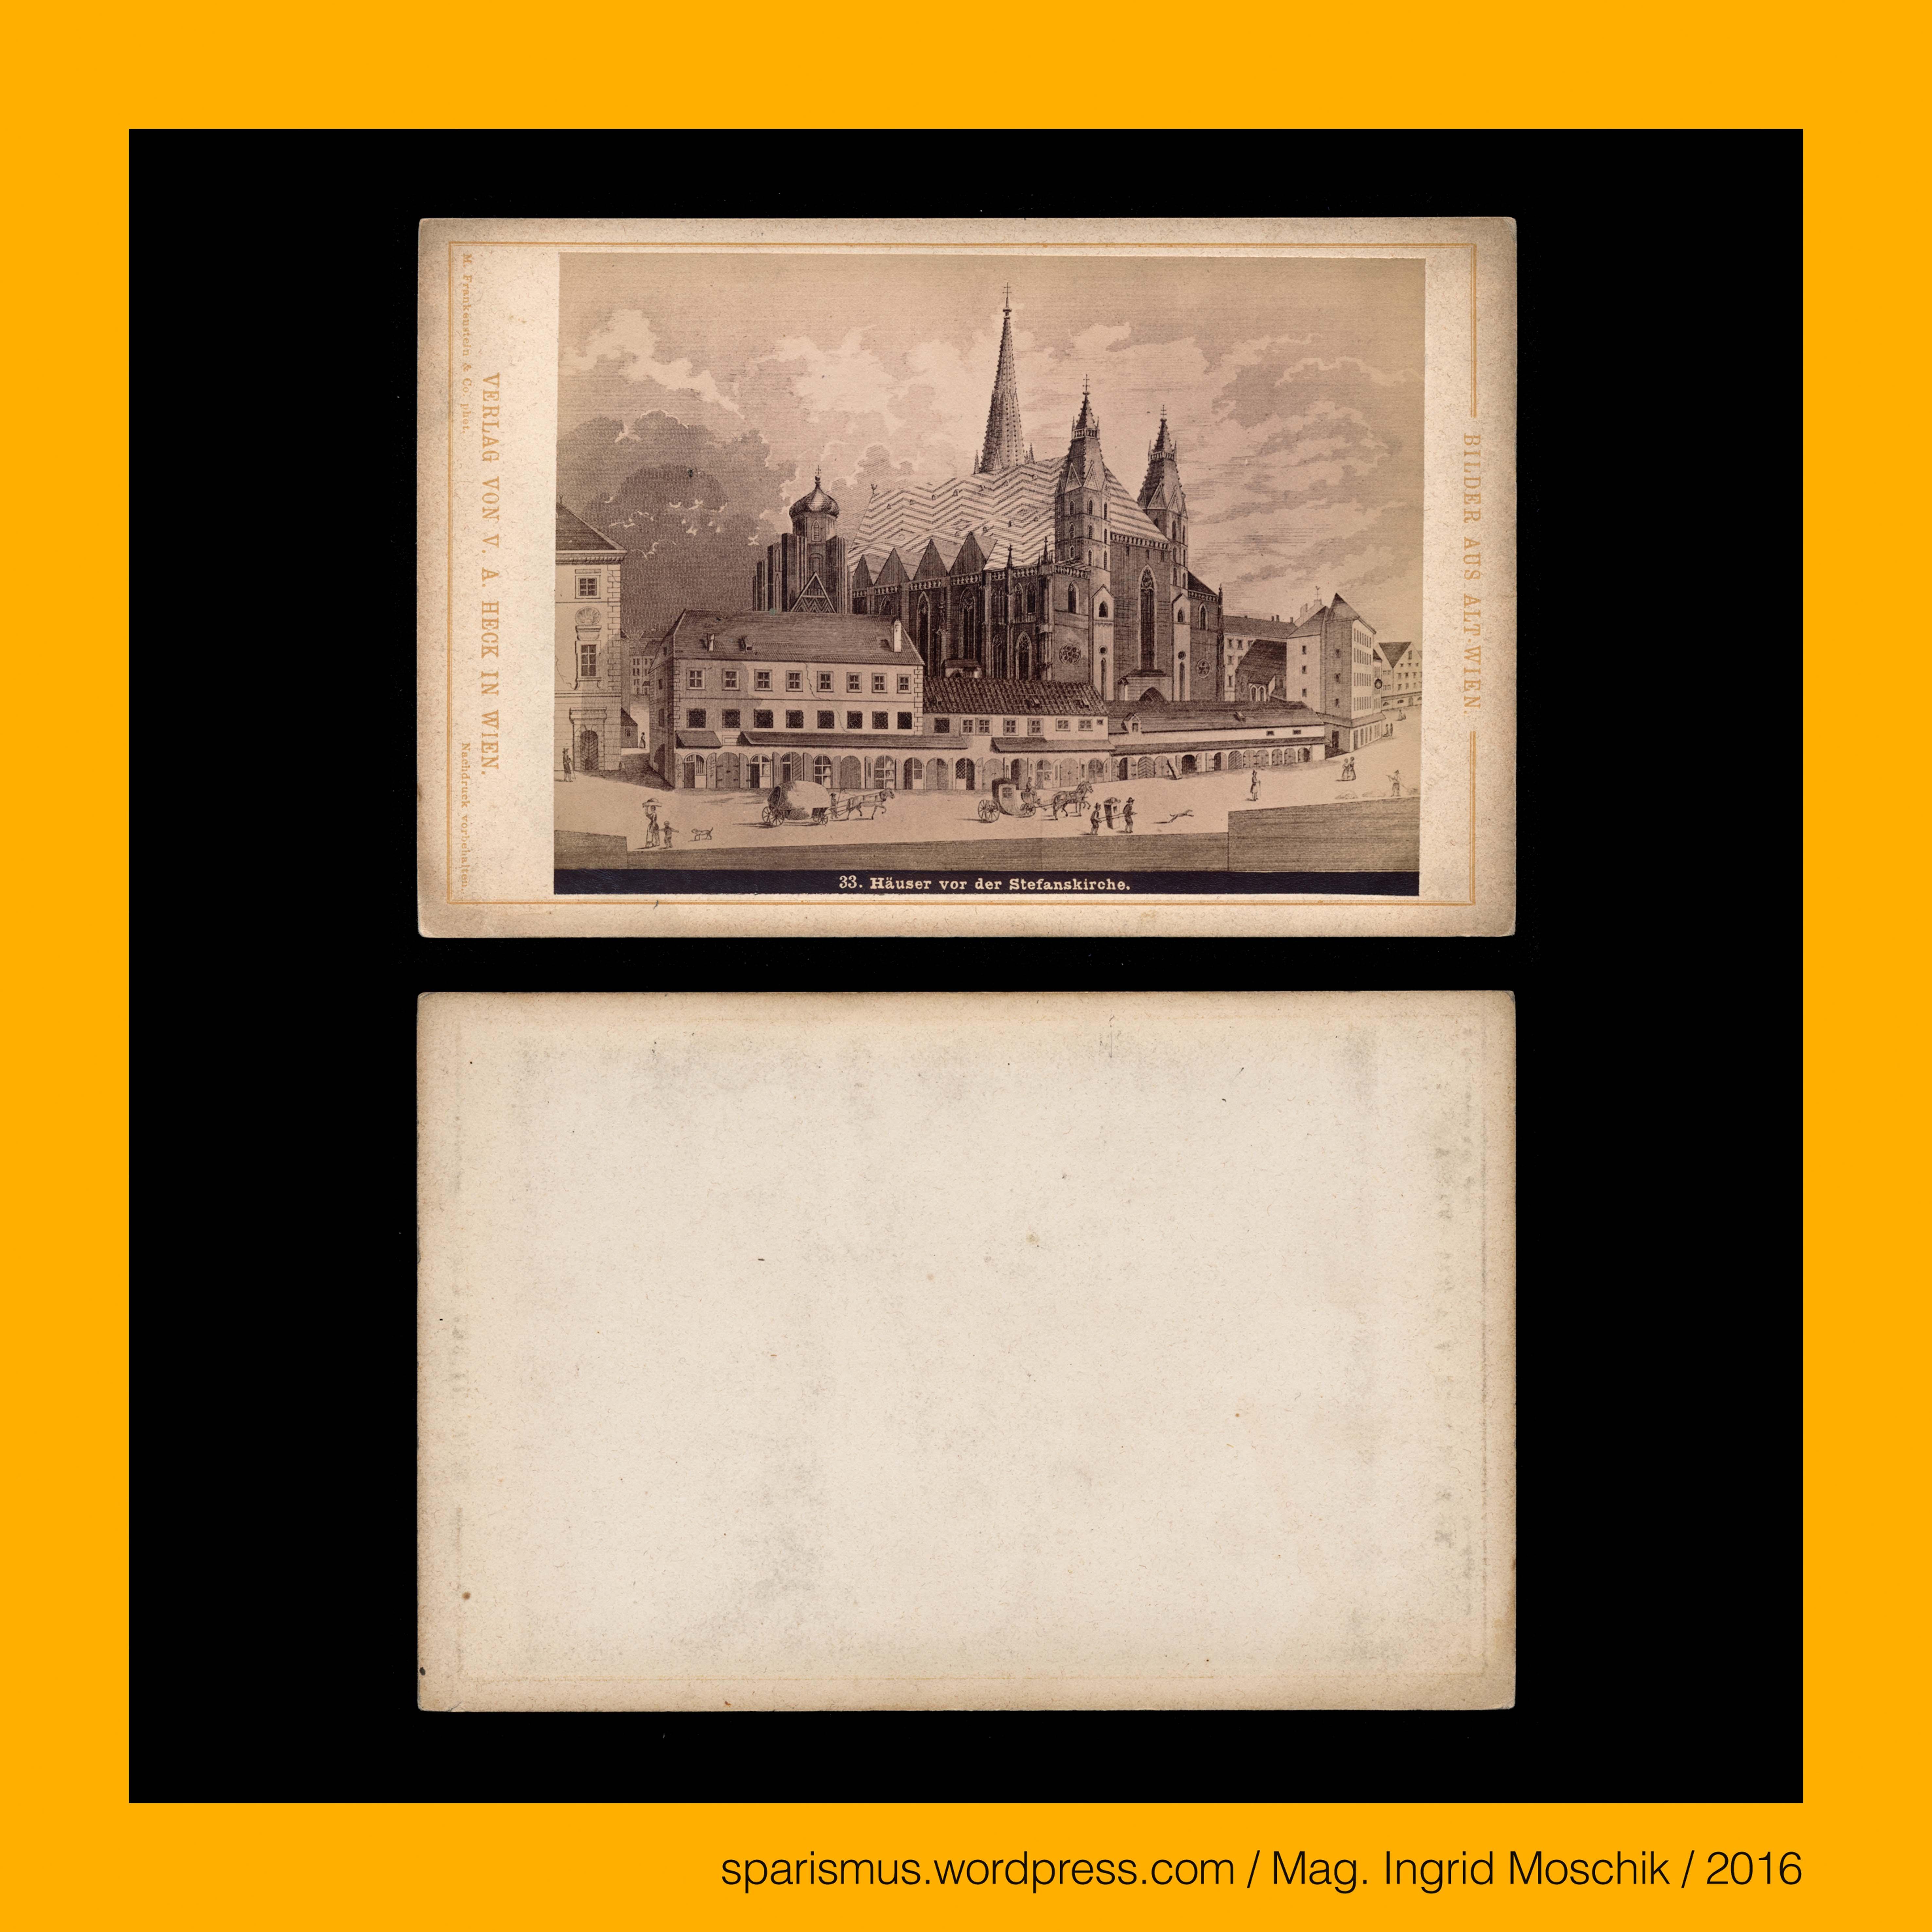 "V A Heck Verlag von V A Heck in Wien Valentin Andreas Heck 1842 Wien """